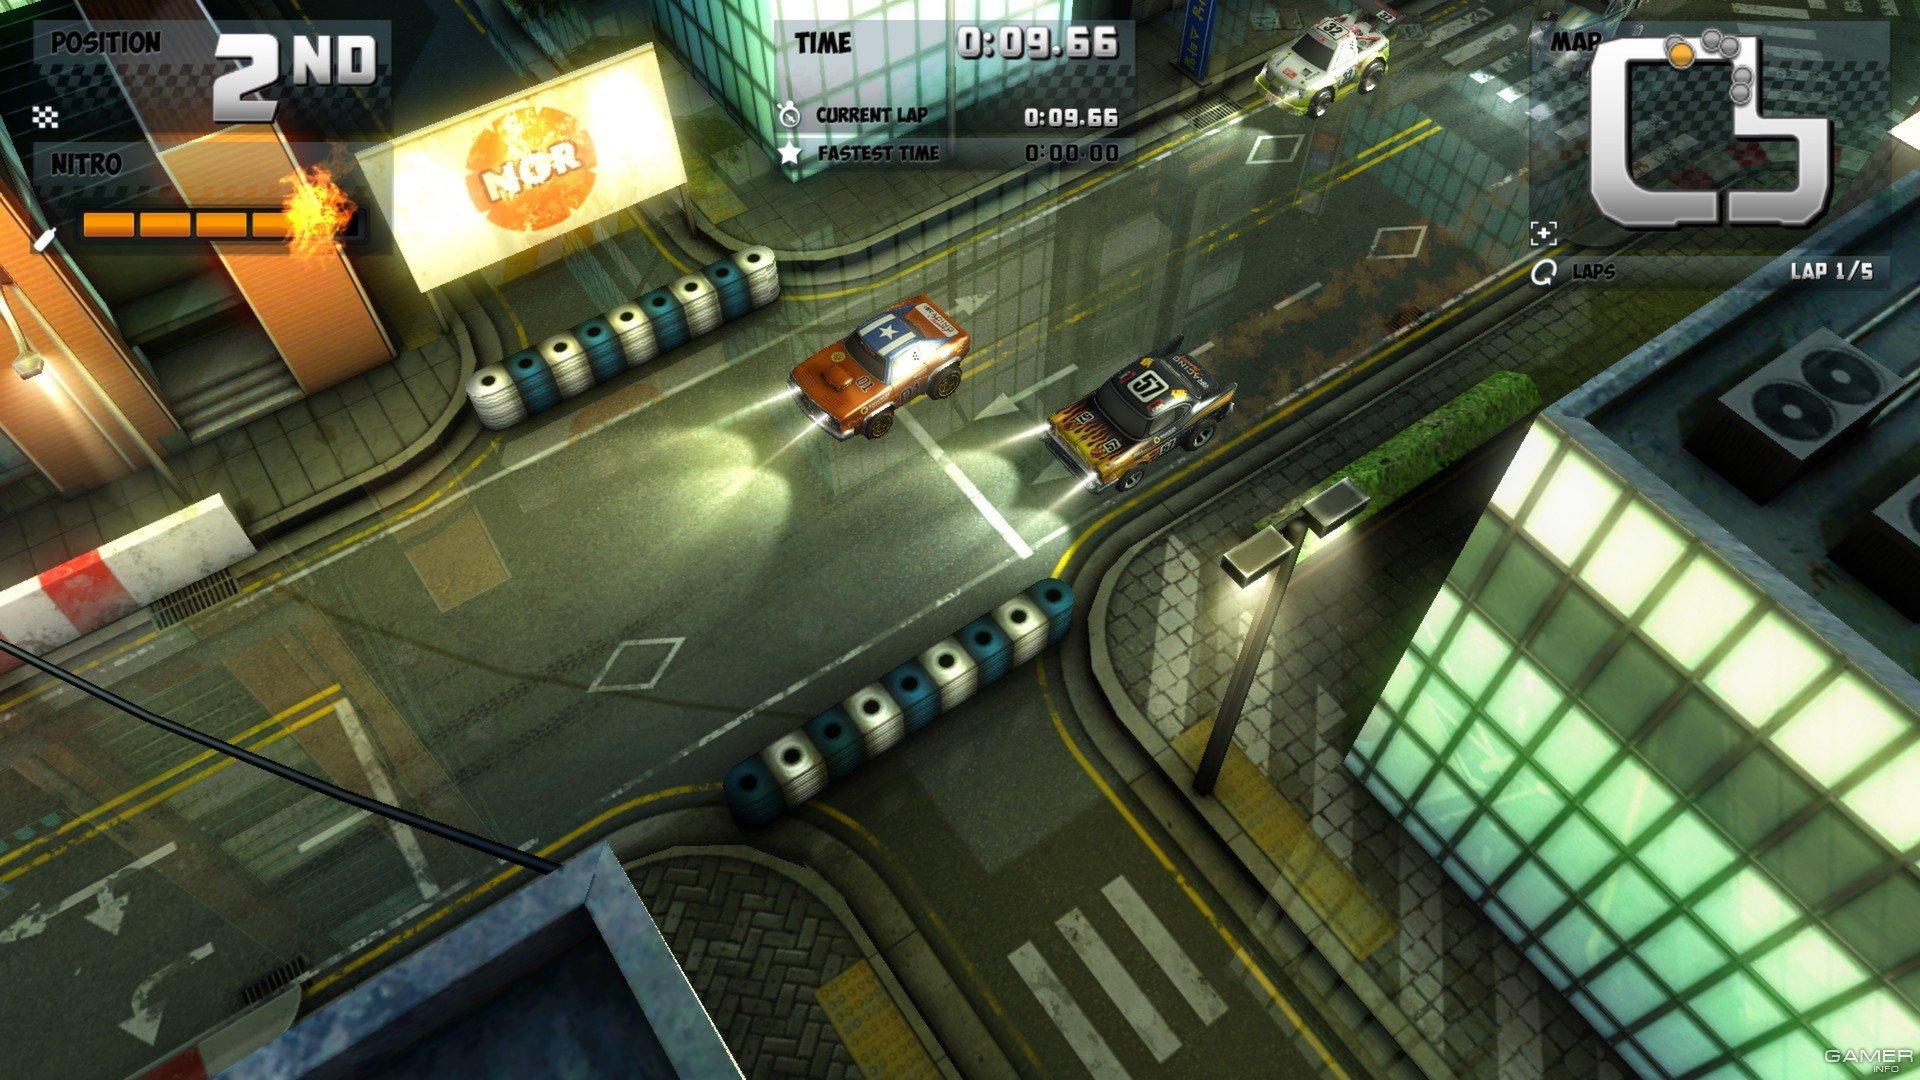 Ios 7 gamestop free download